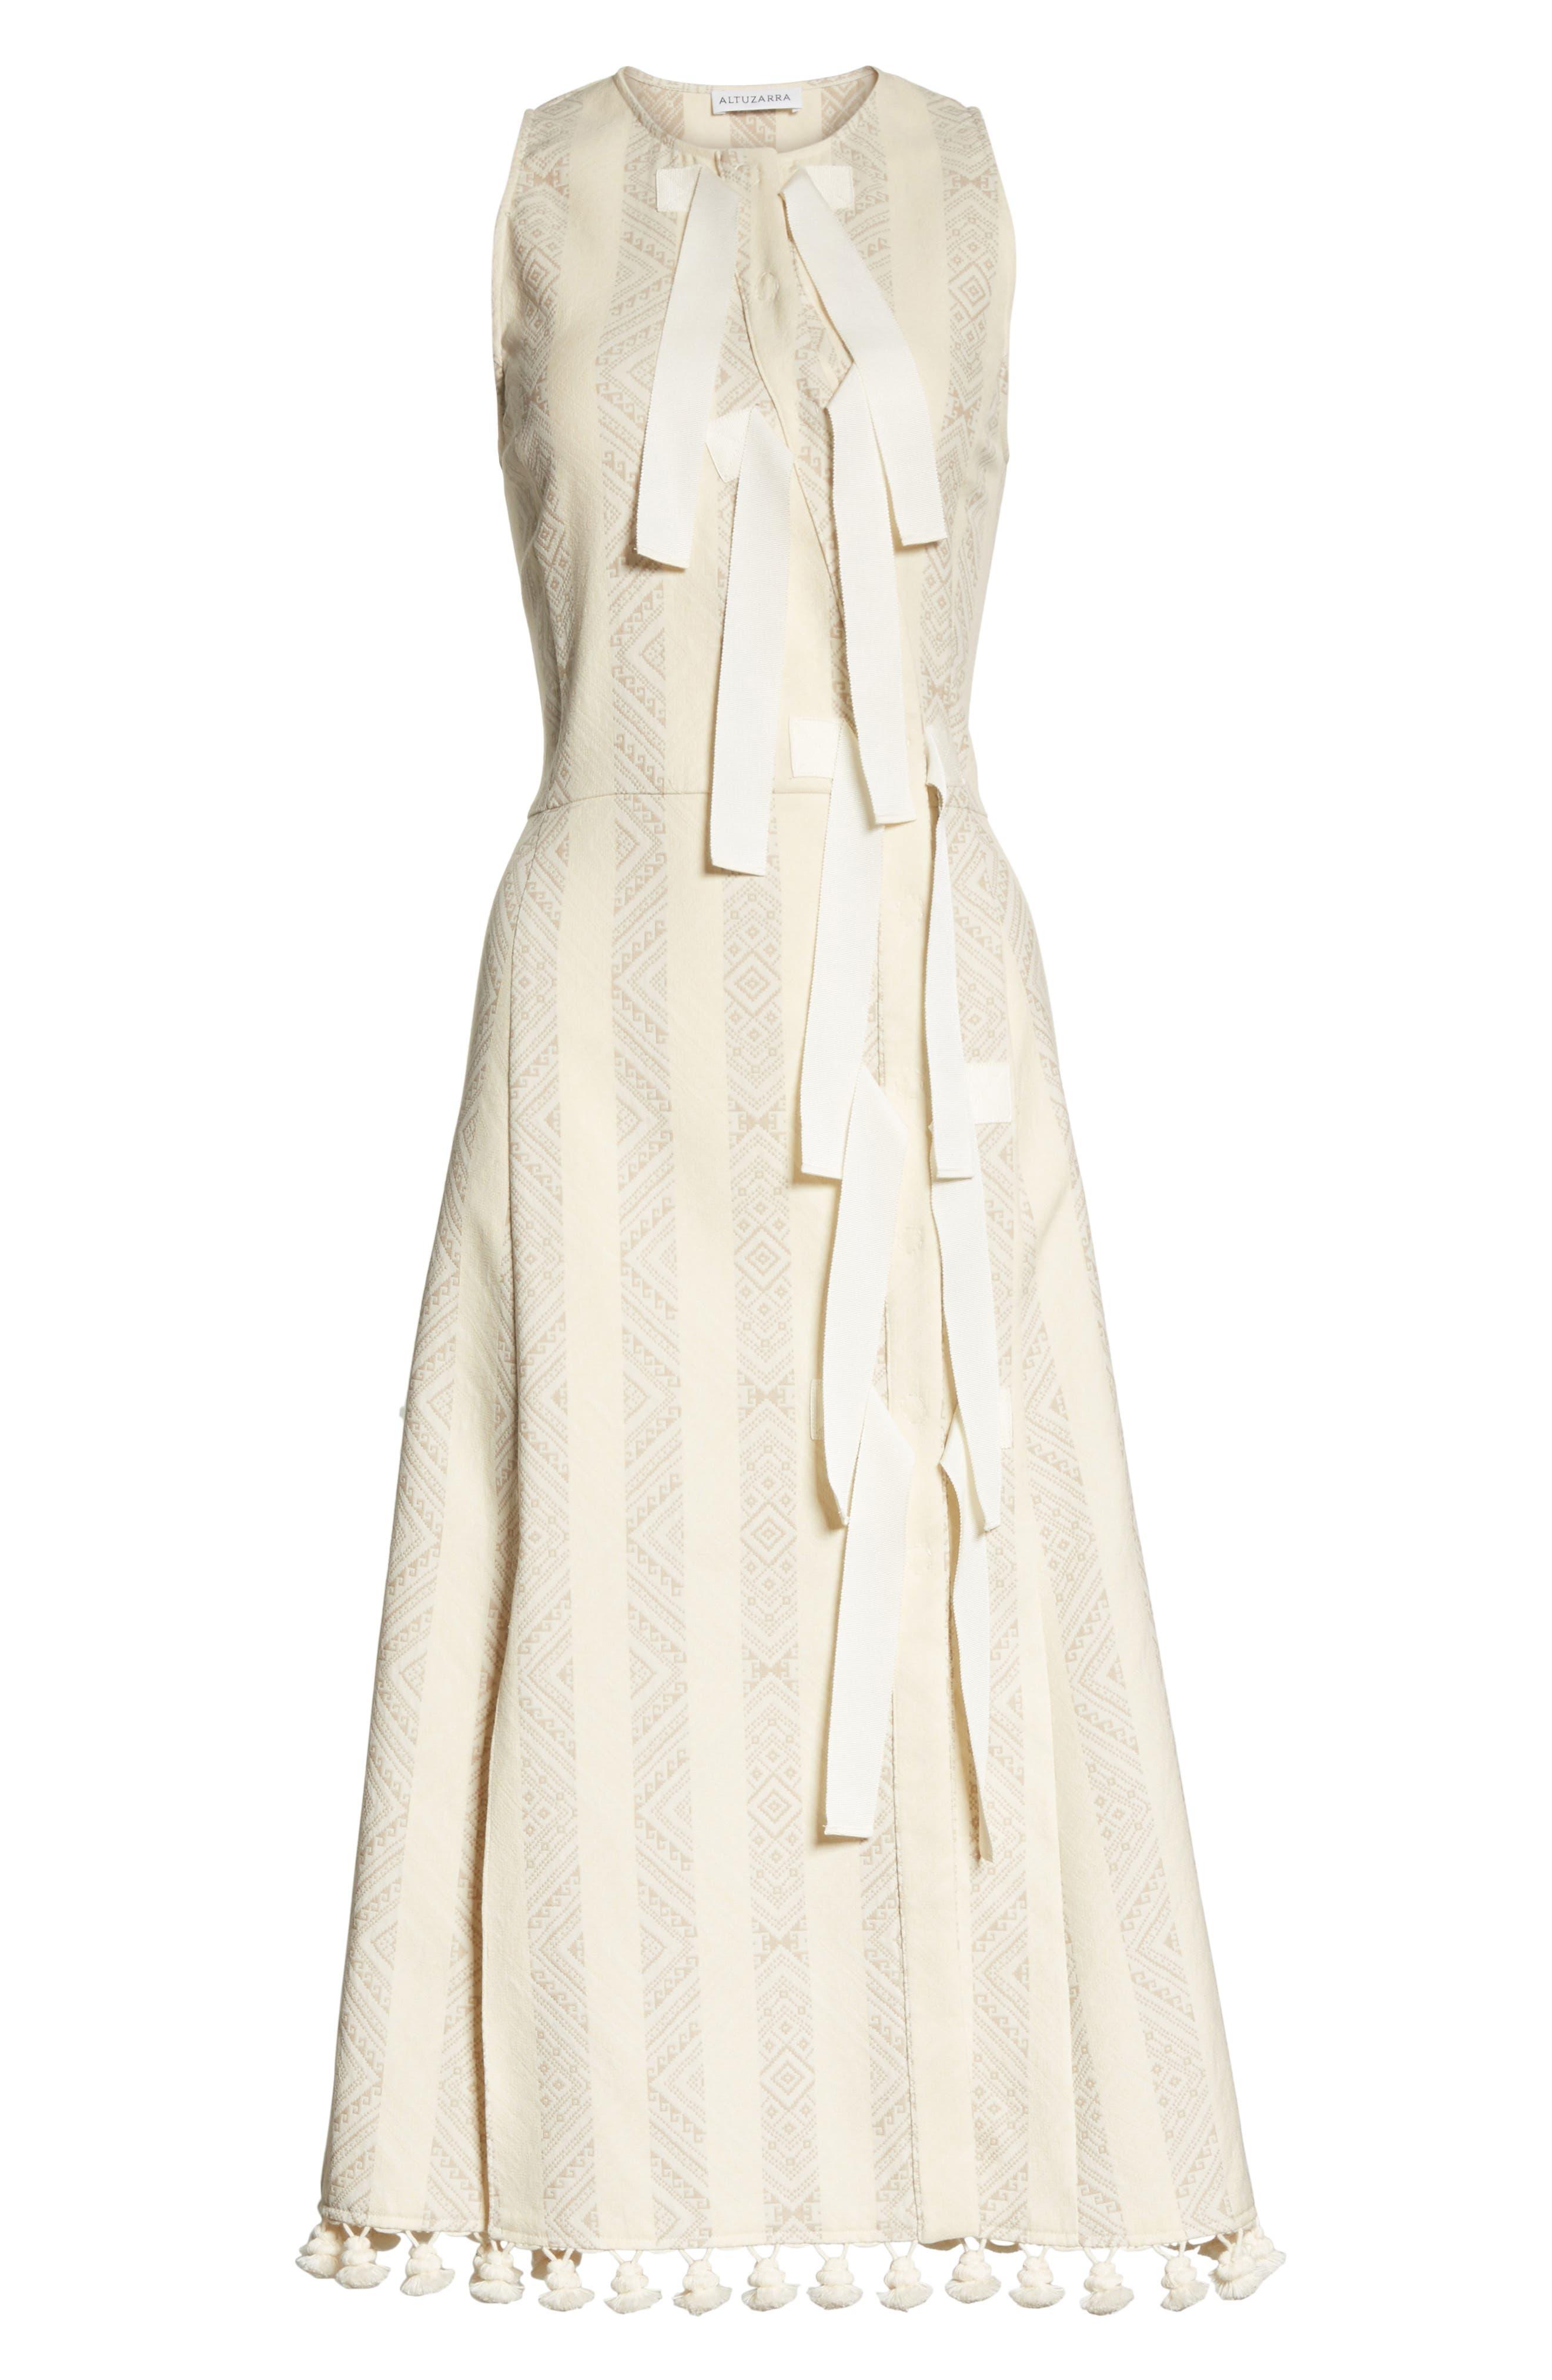 Grosgrain Tie Stripe Dress,                             Alternate thumbnail 6, color,                             106